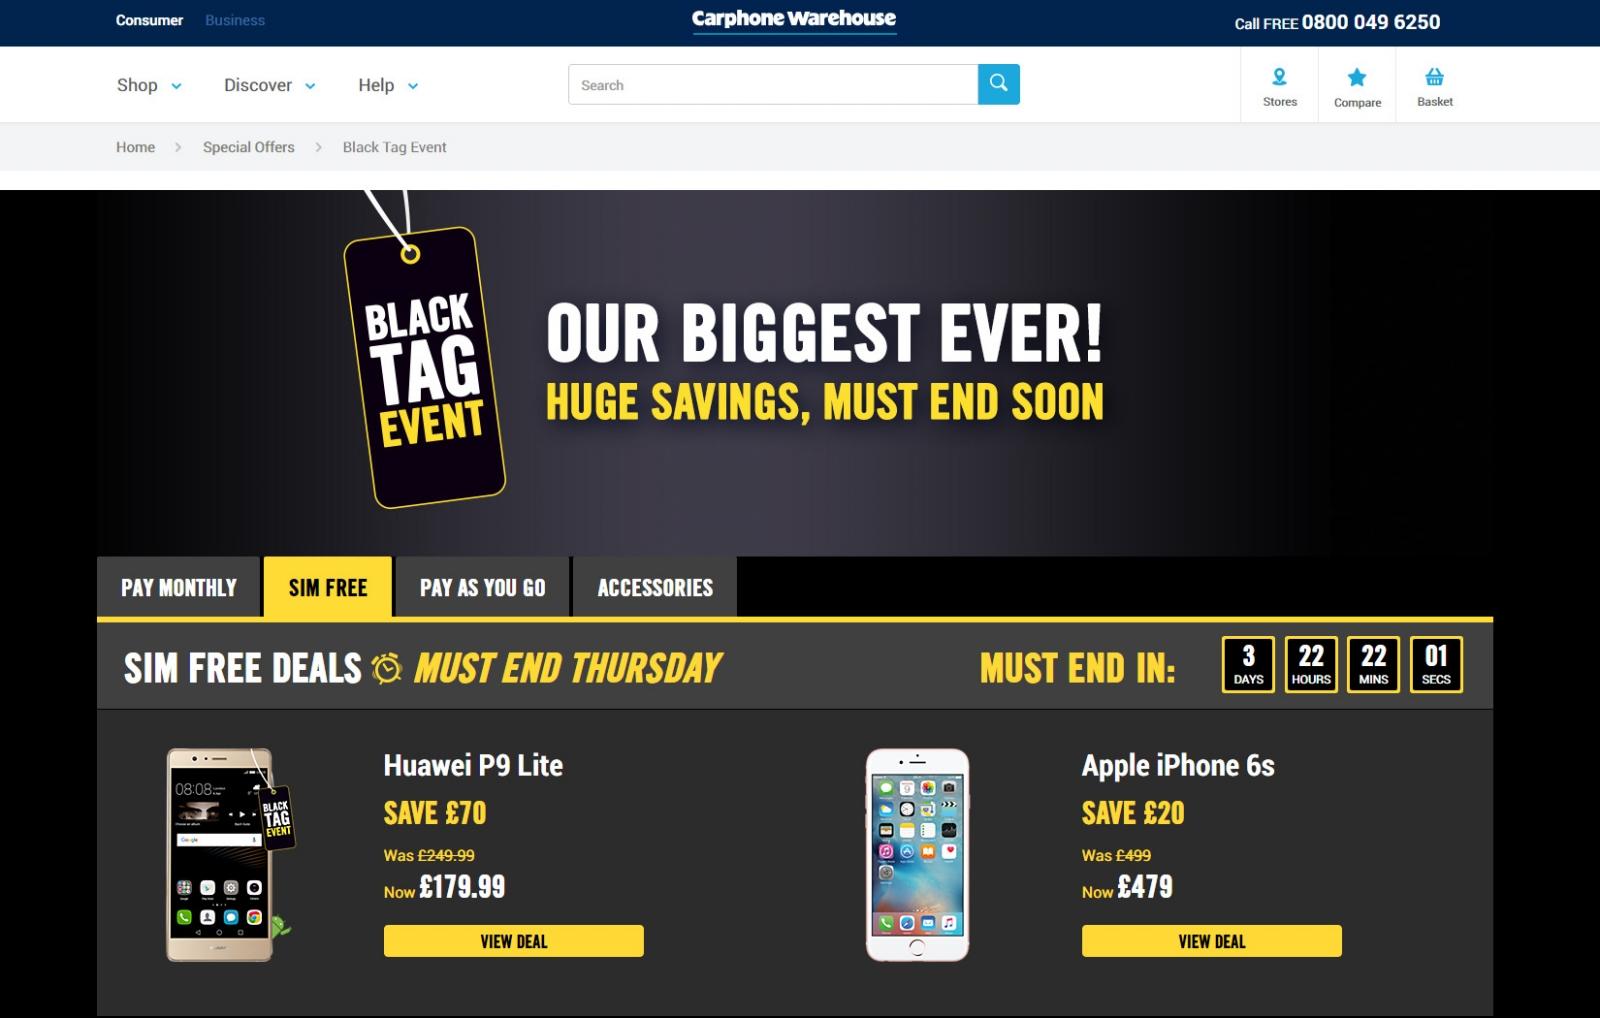 Carphone Warehouse Iphone  Pay As You Go